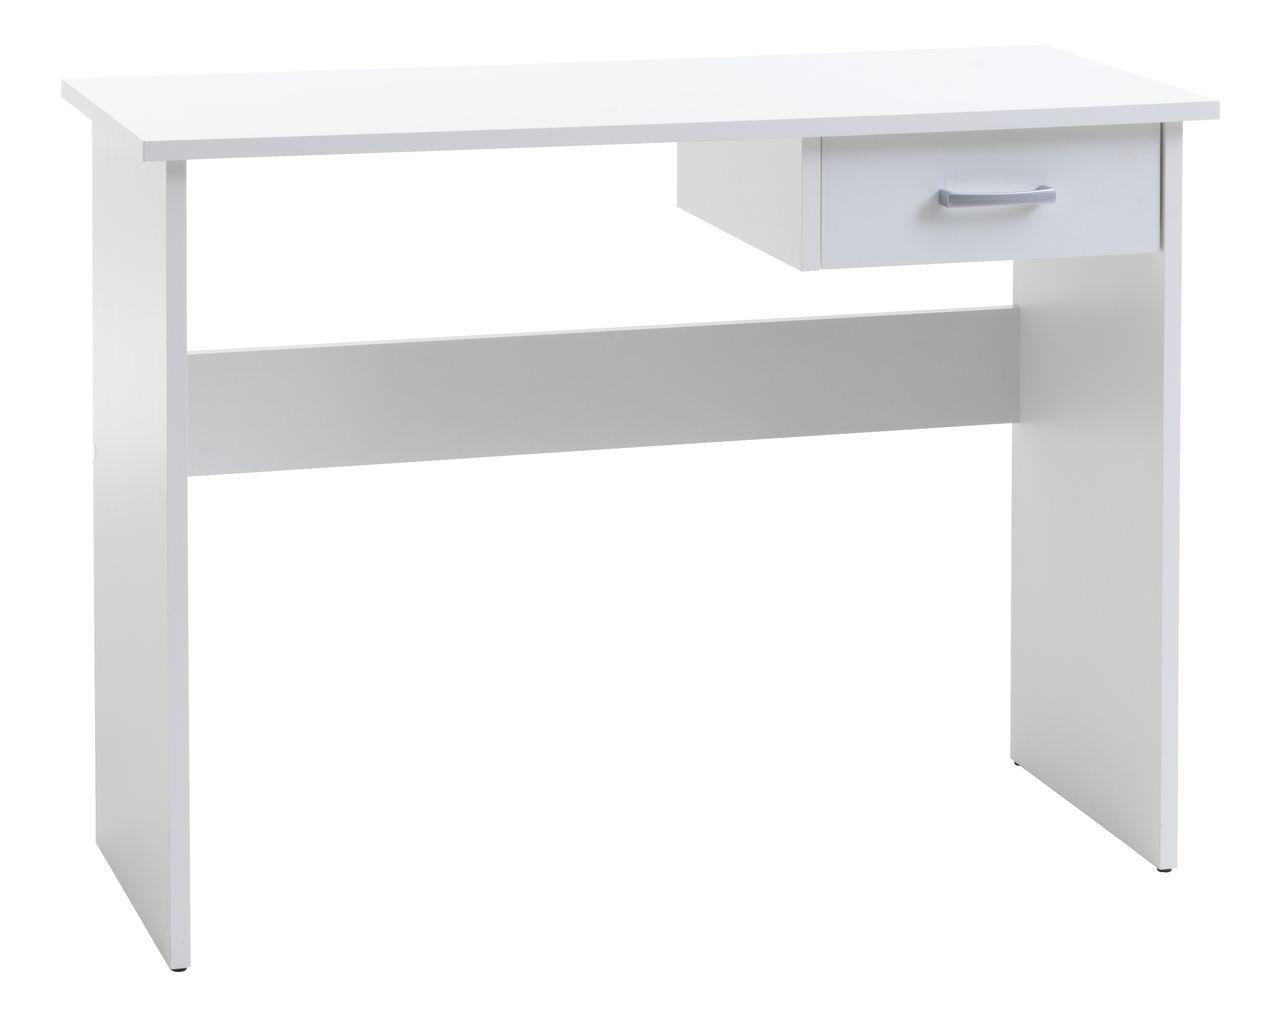 1826aa6c983e7 Písací stôl KARUP 40x100 biela | JYSK